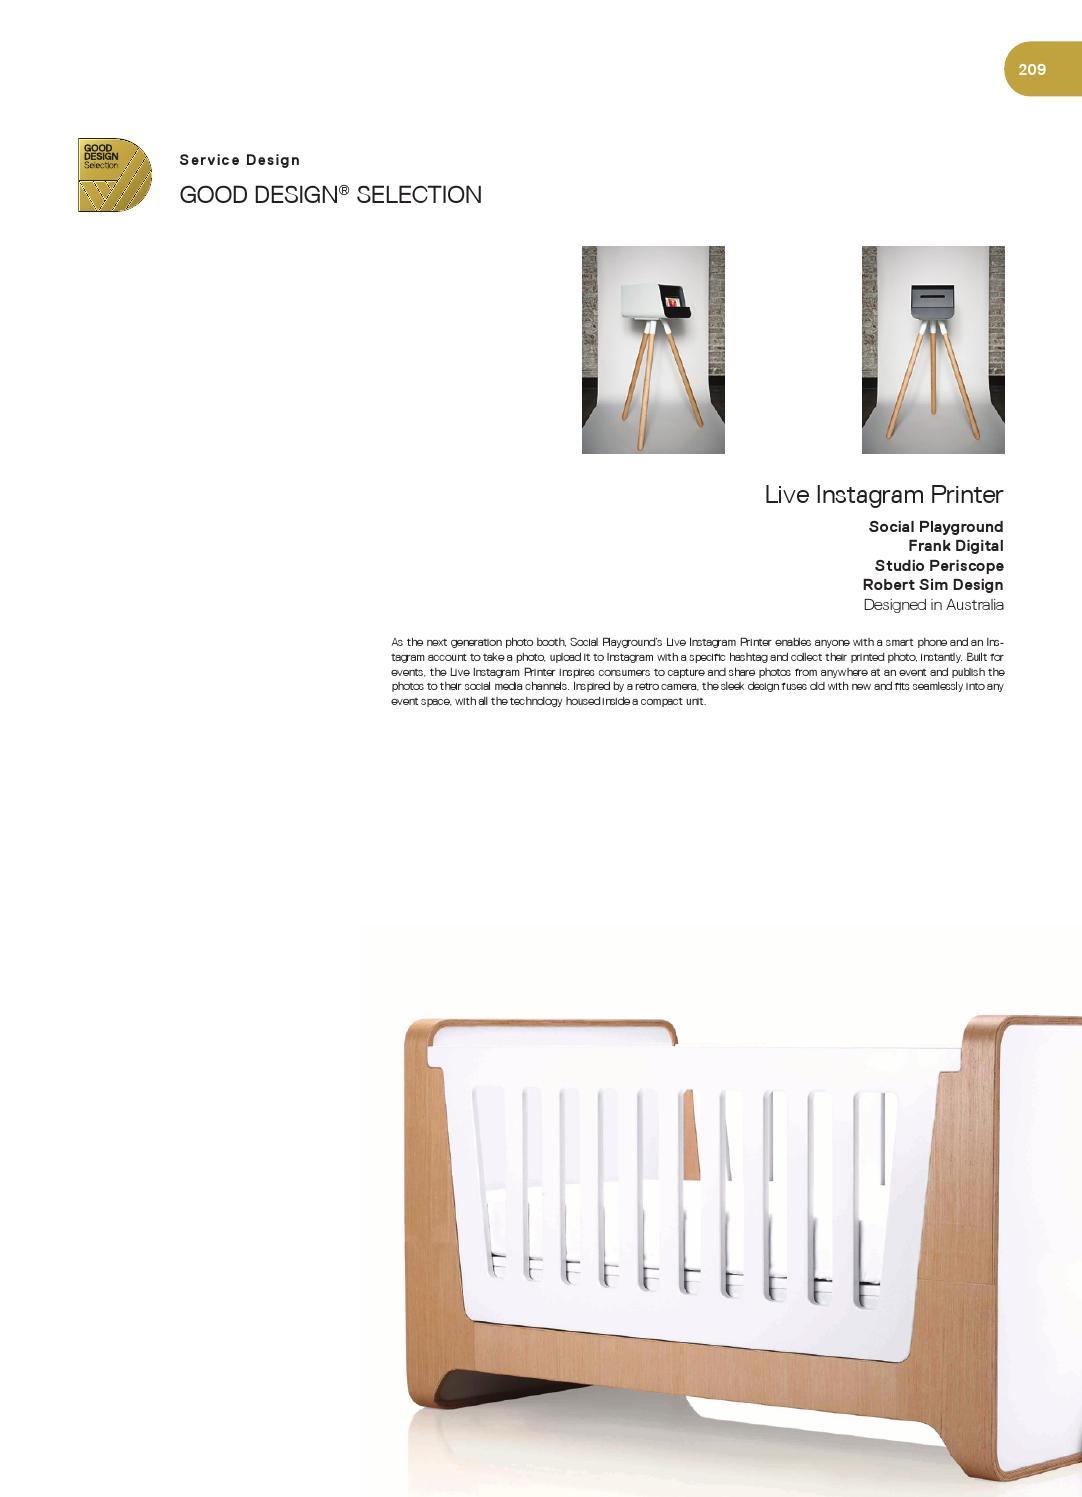 Good Design Awards Yearbook 2014 by Good Design Australia